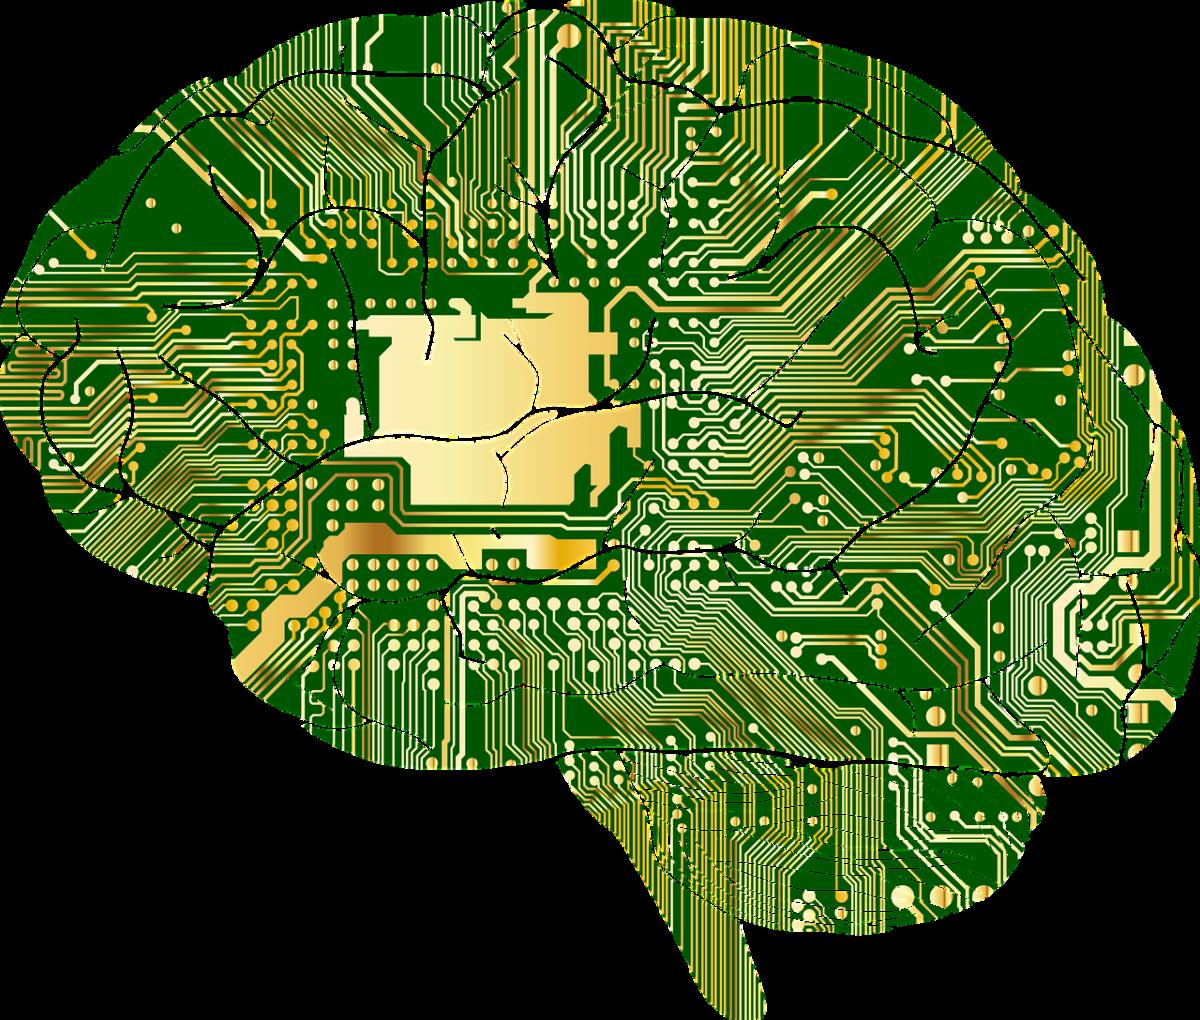 obrazek mózg